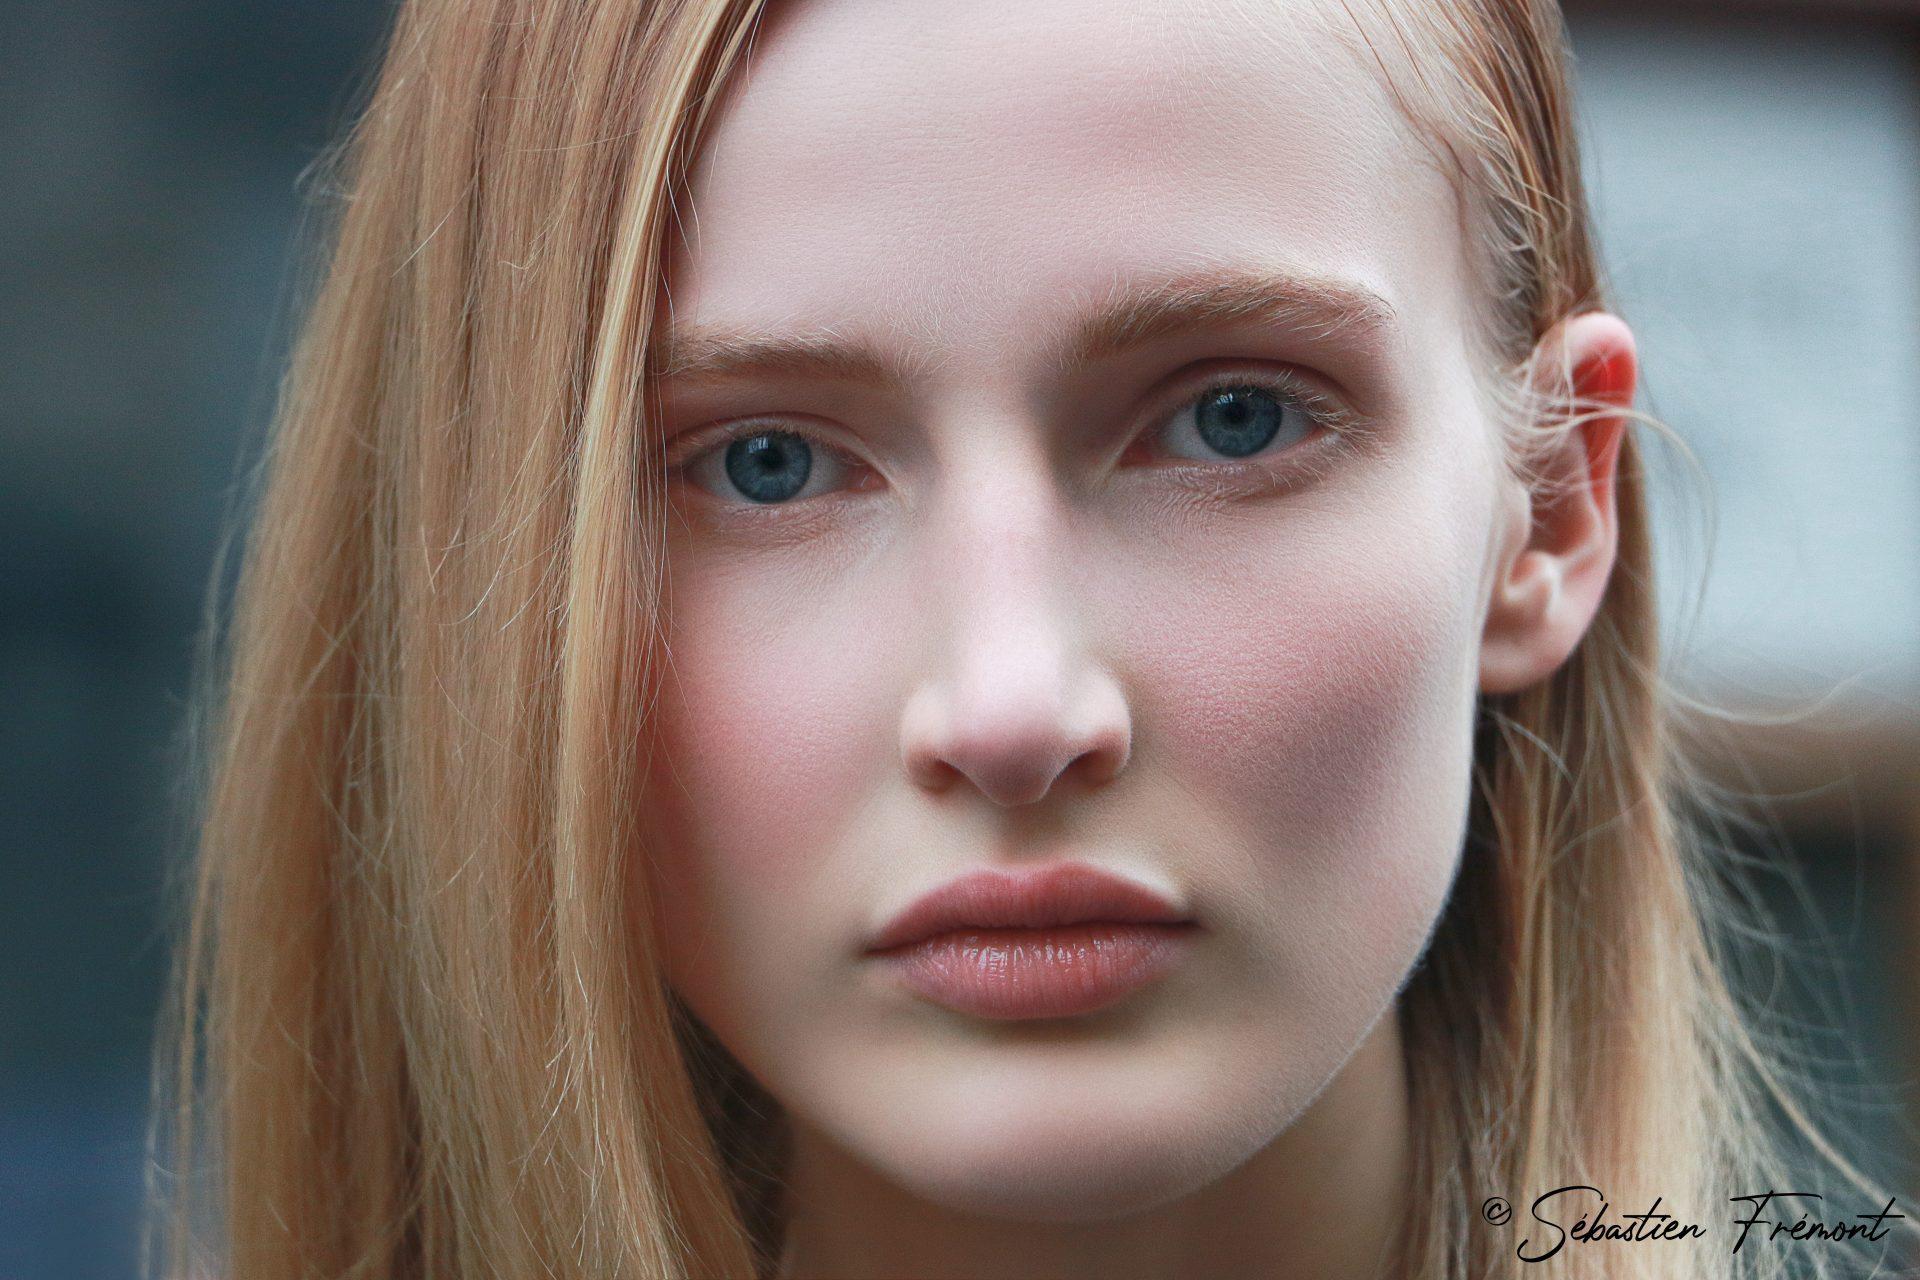 French Photographer Portrait Photography Leah Rodl / Balmain